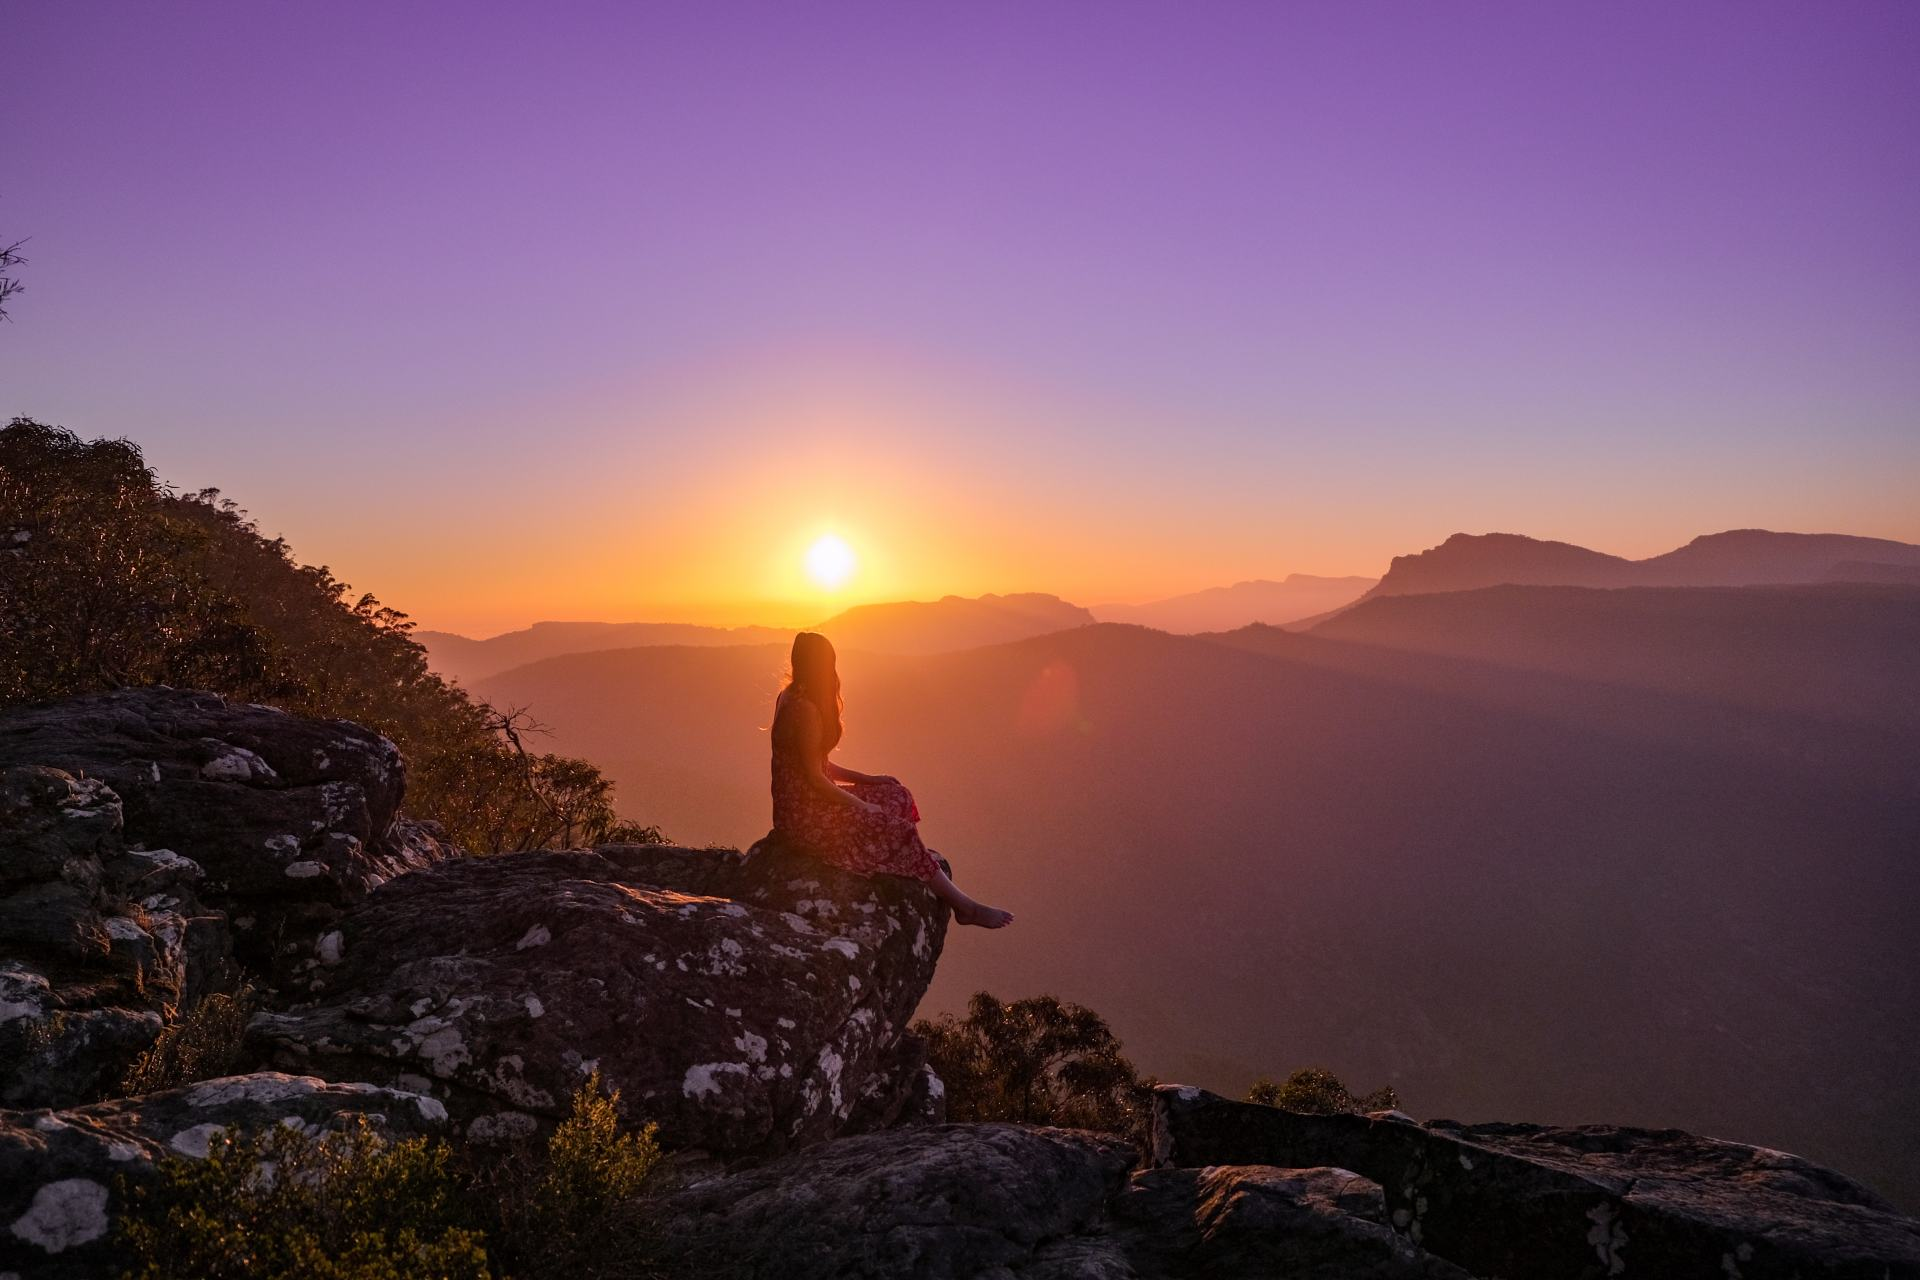 grampains at sunrise